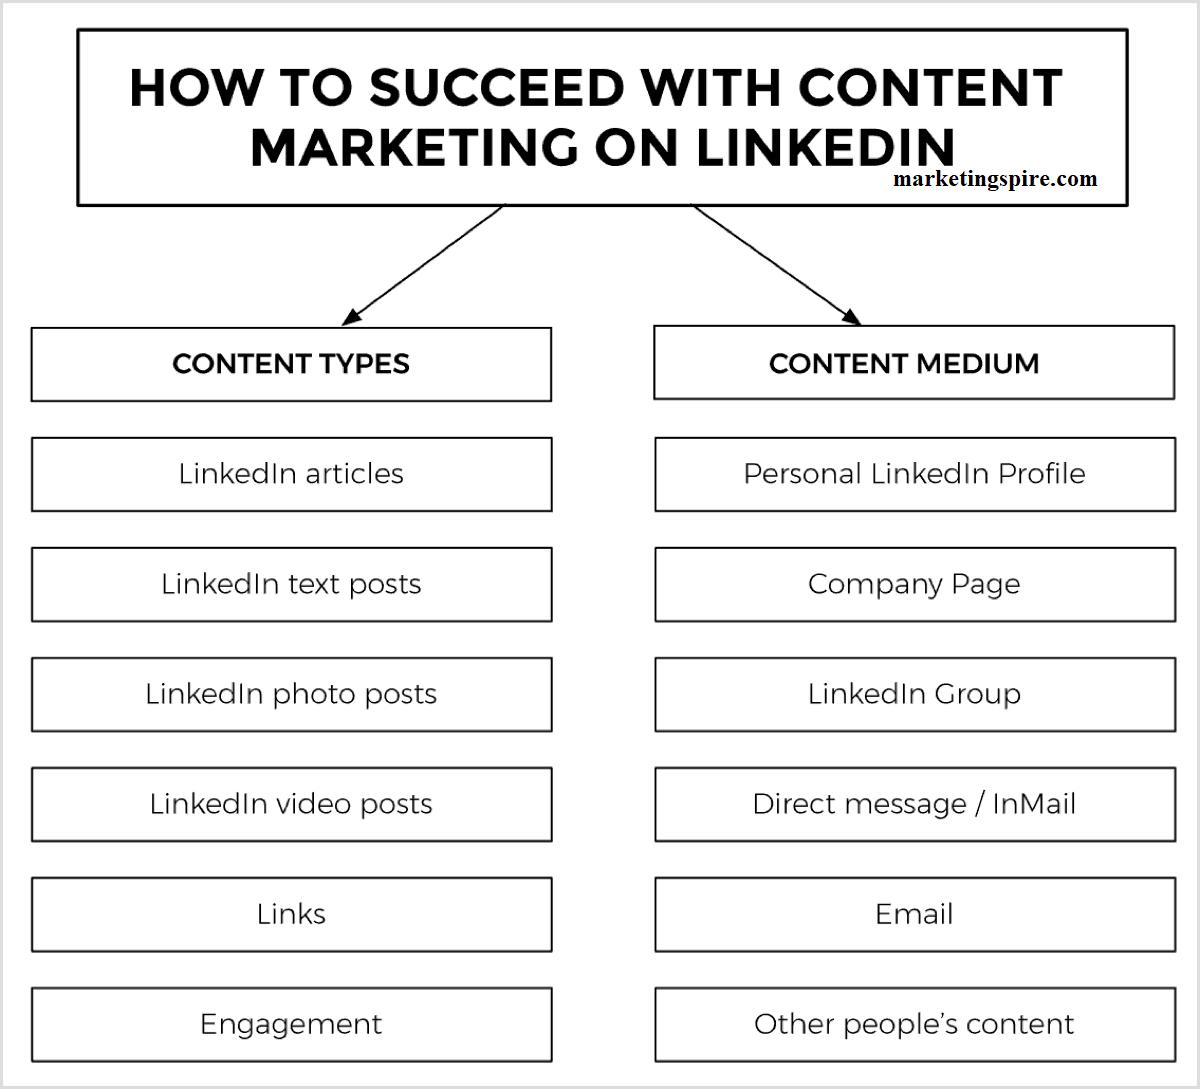 Content for LinkedIn marketing - Marketingspire